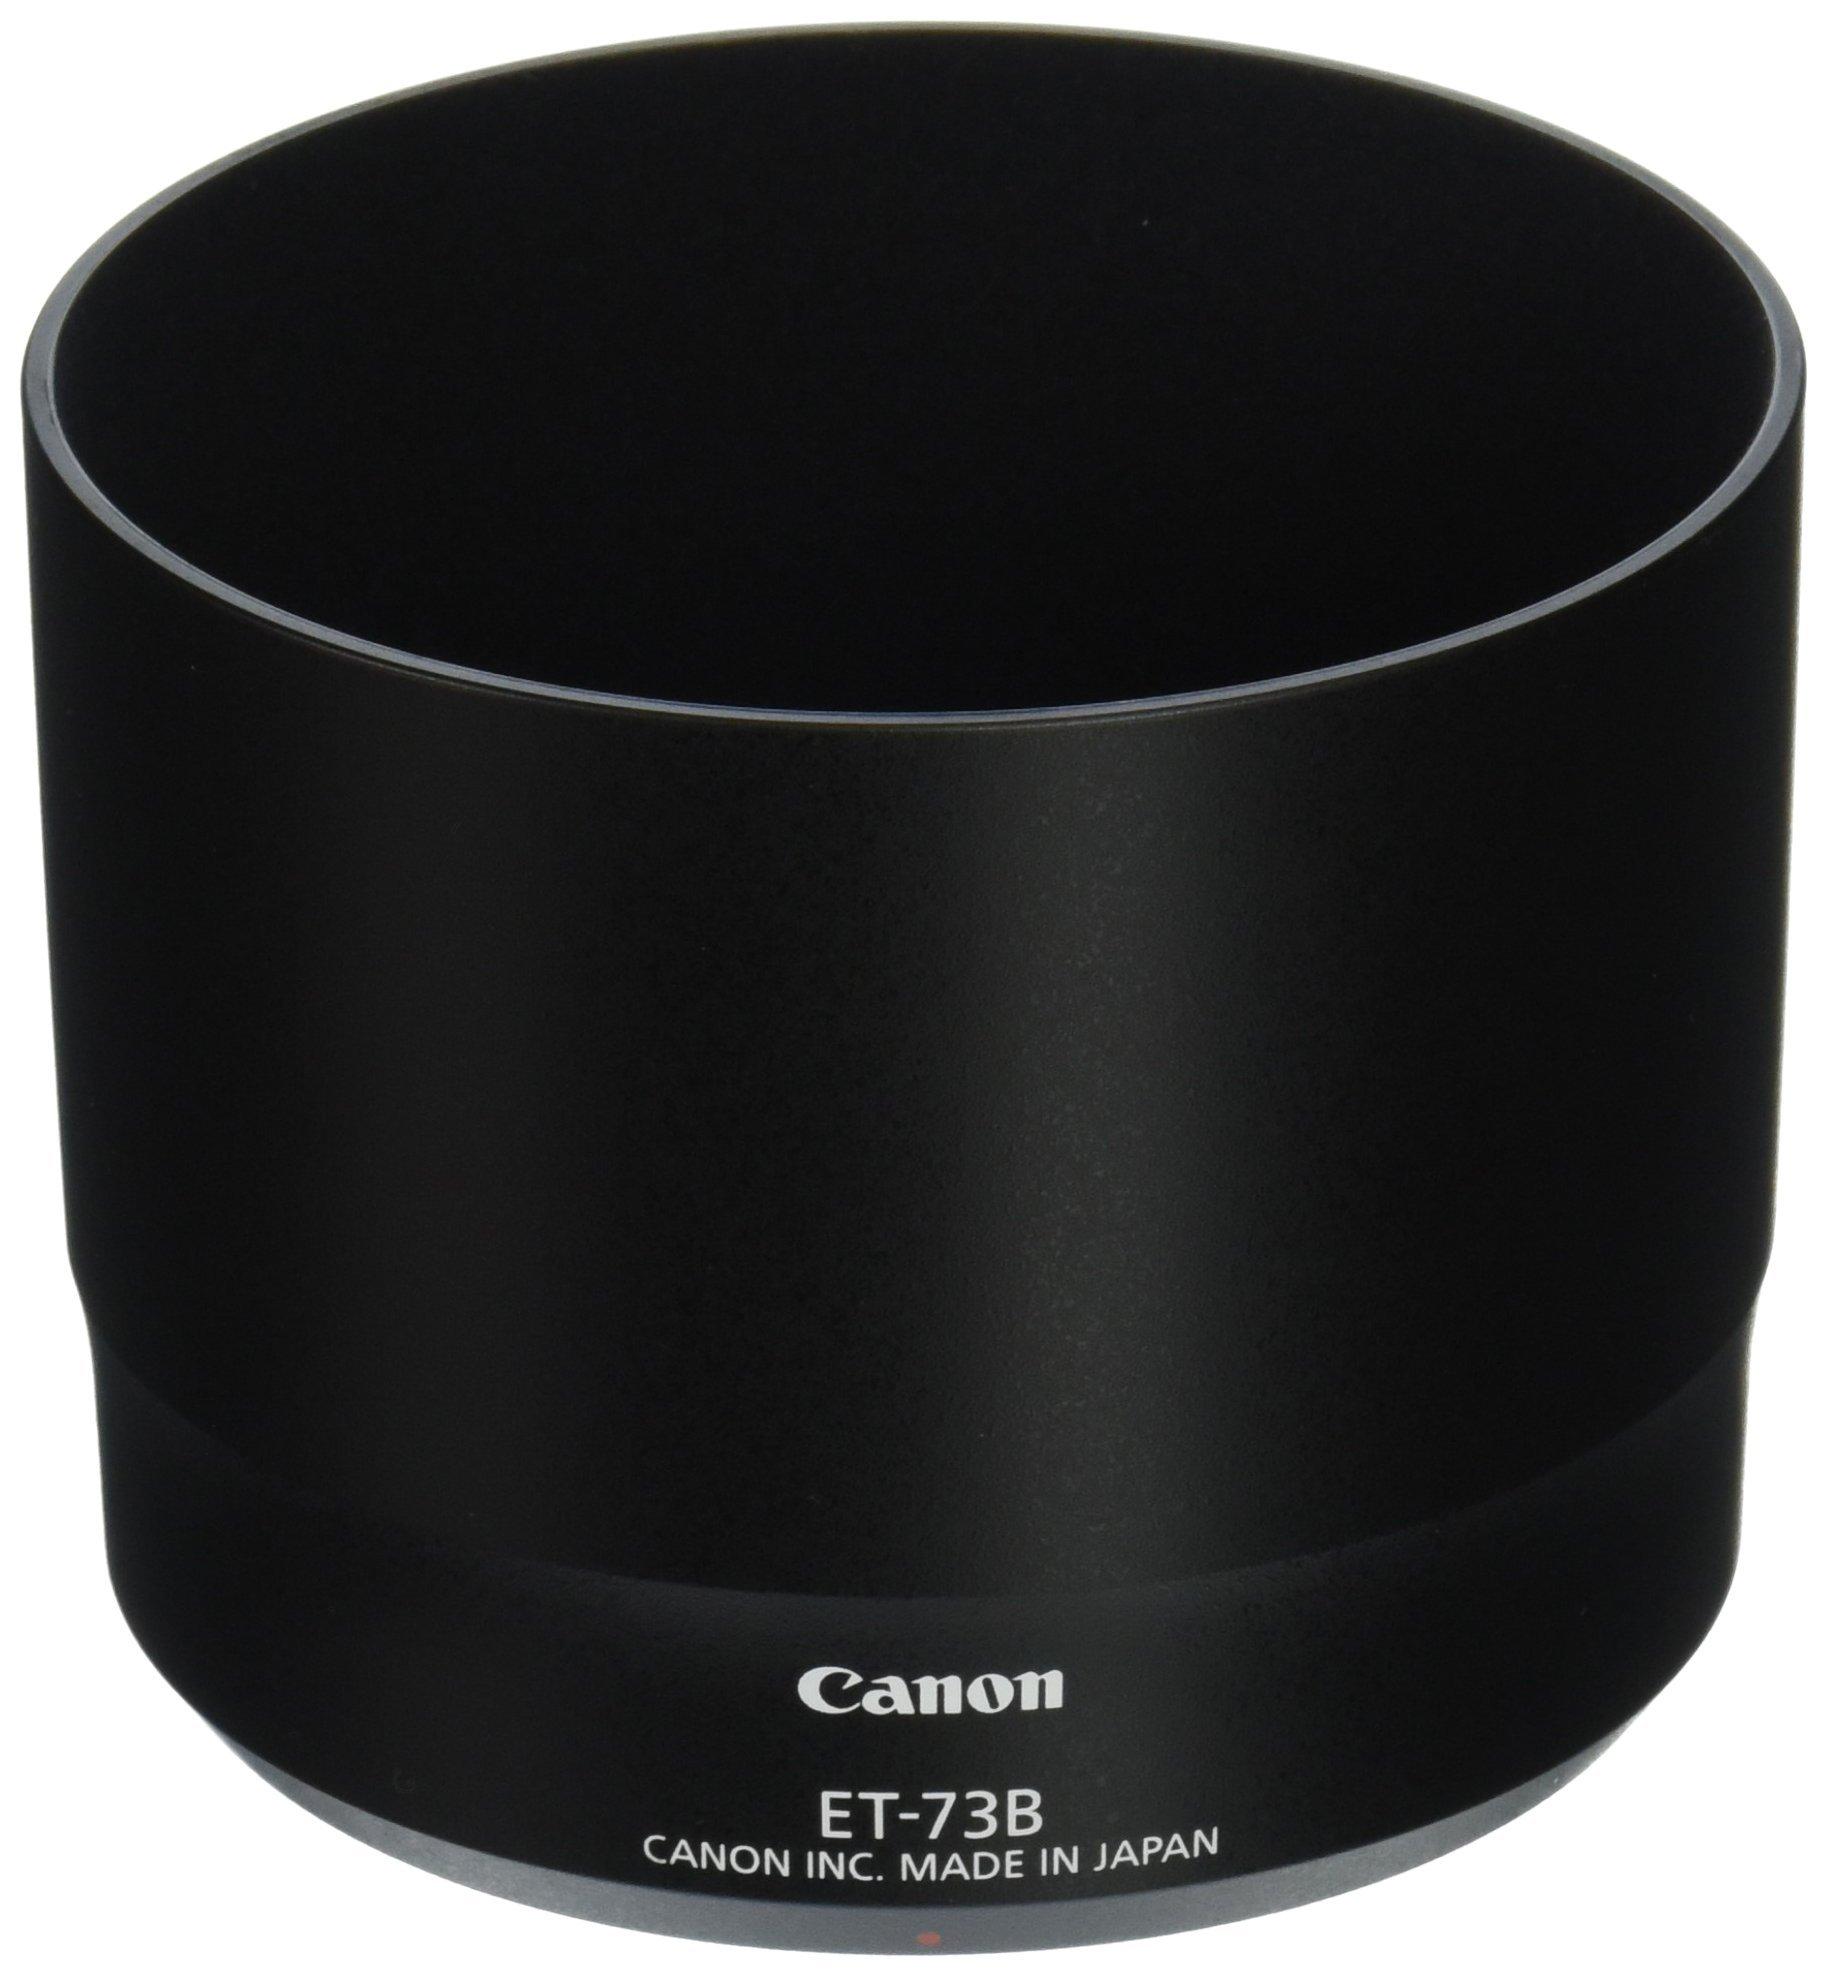 Canon ET-73B Lens Hood for EF 70-300 f/4-5.6L IS USM Lens